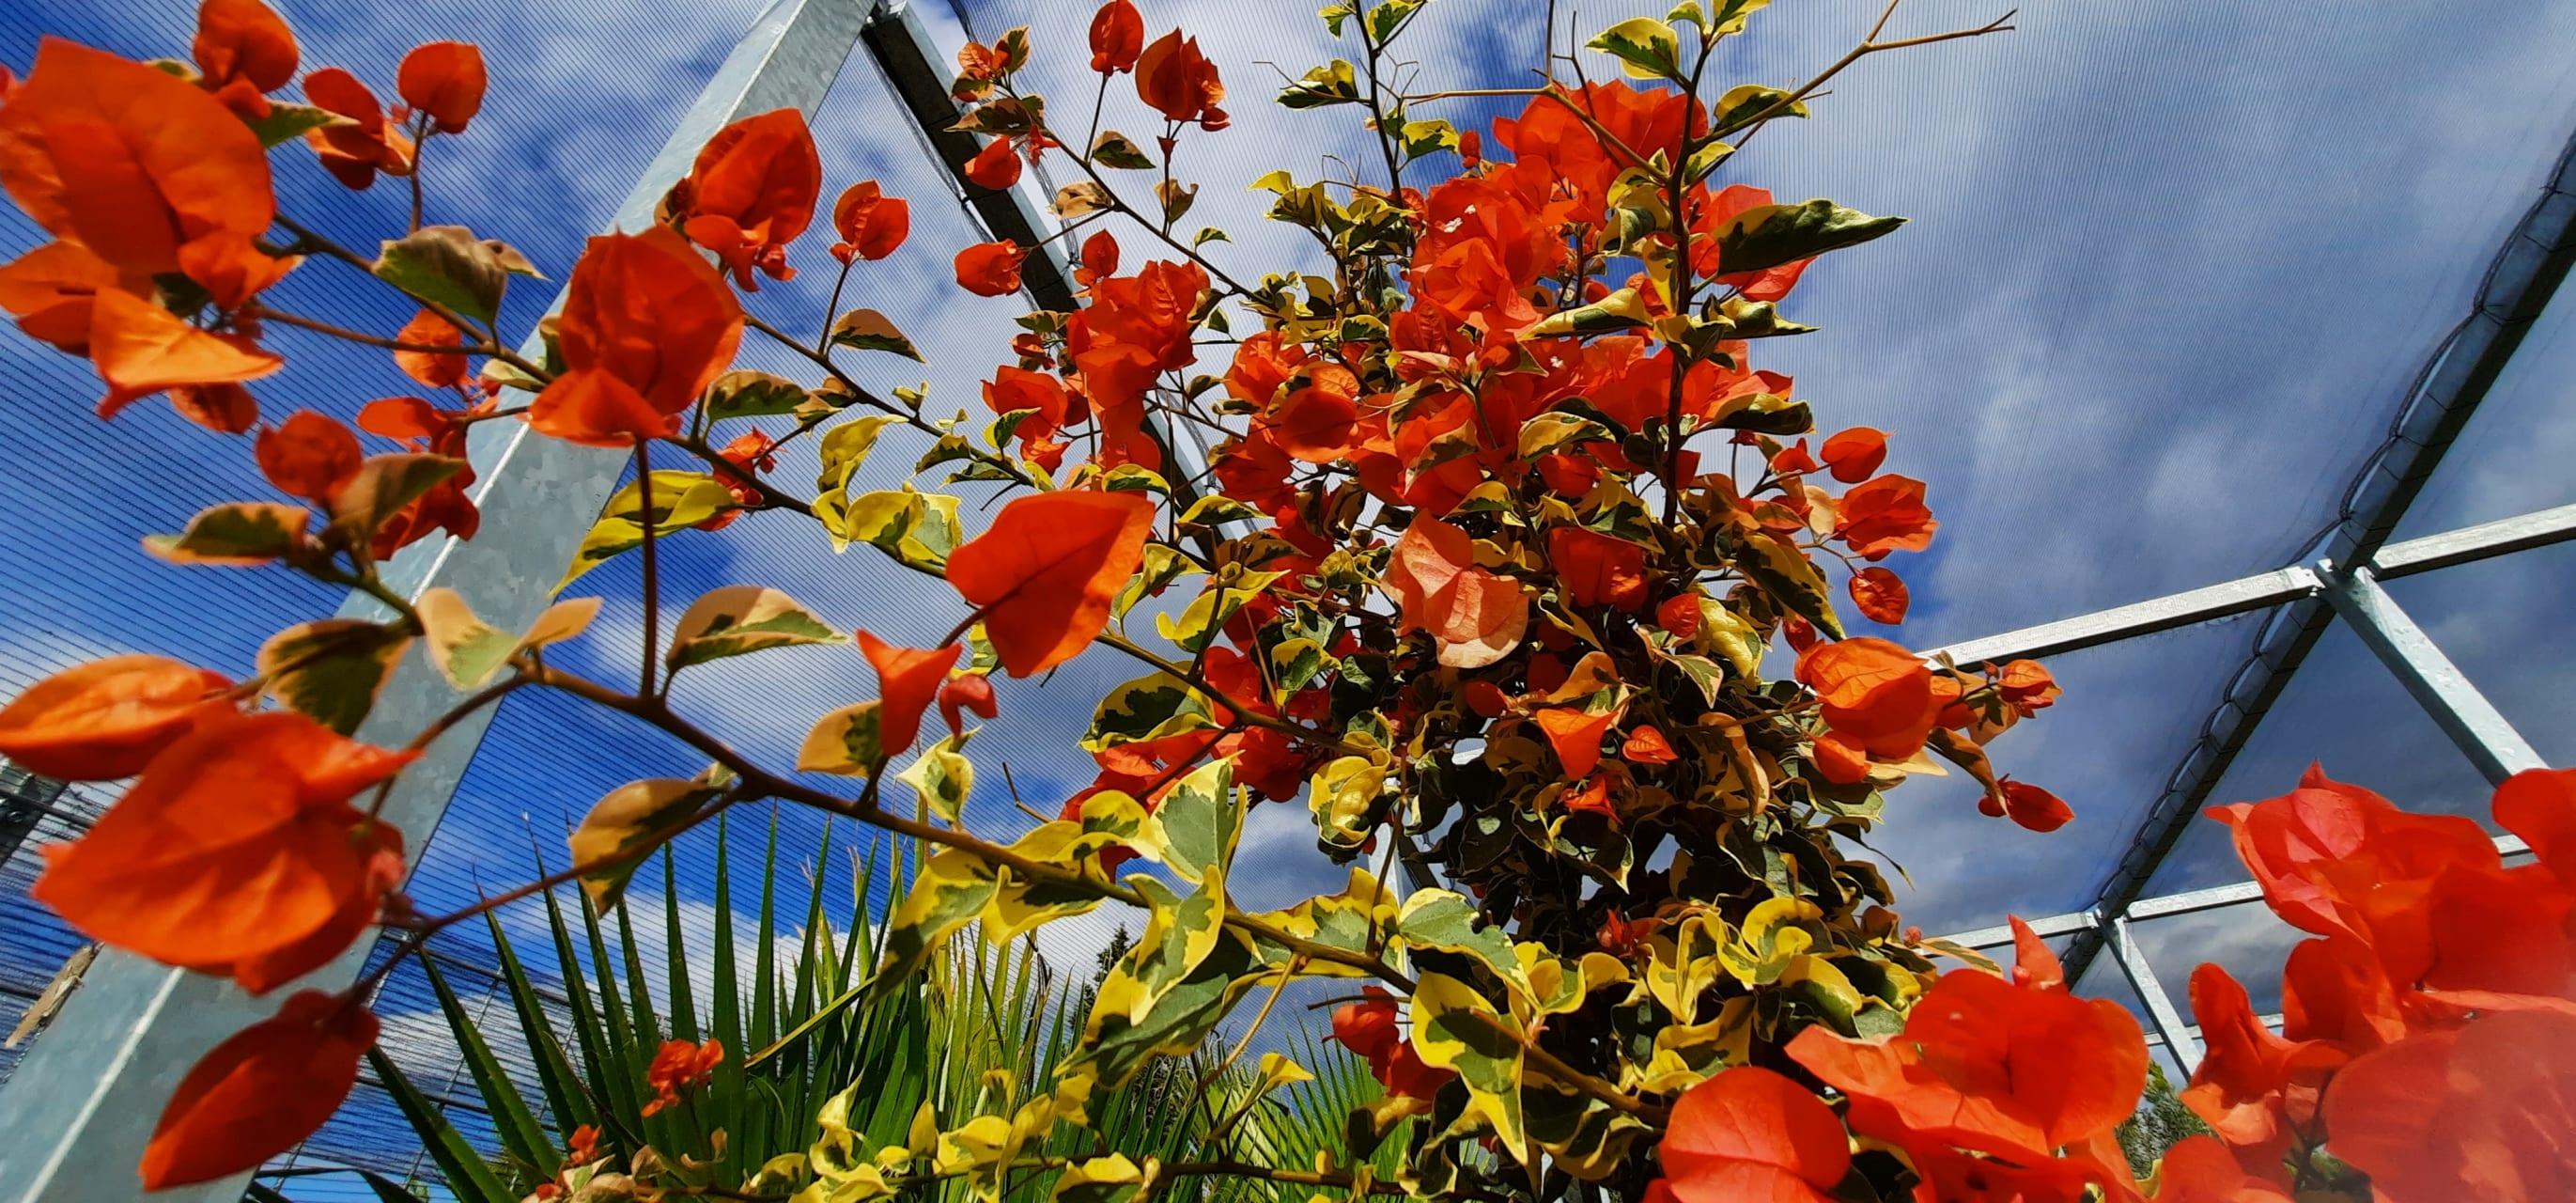 Korcula - Flower Paradise in October, November & December